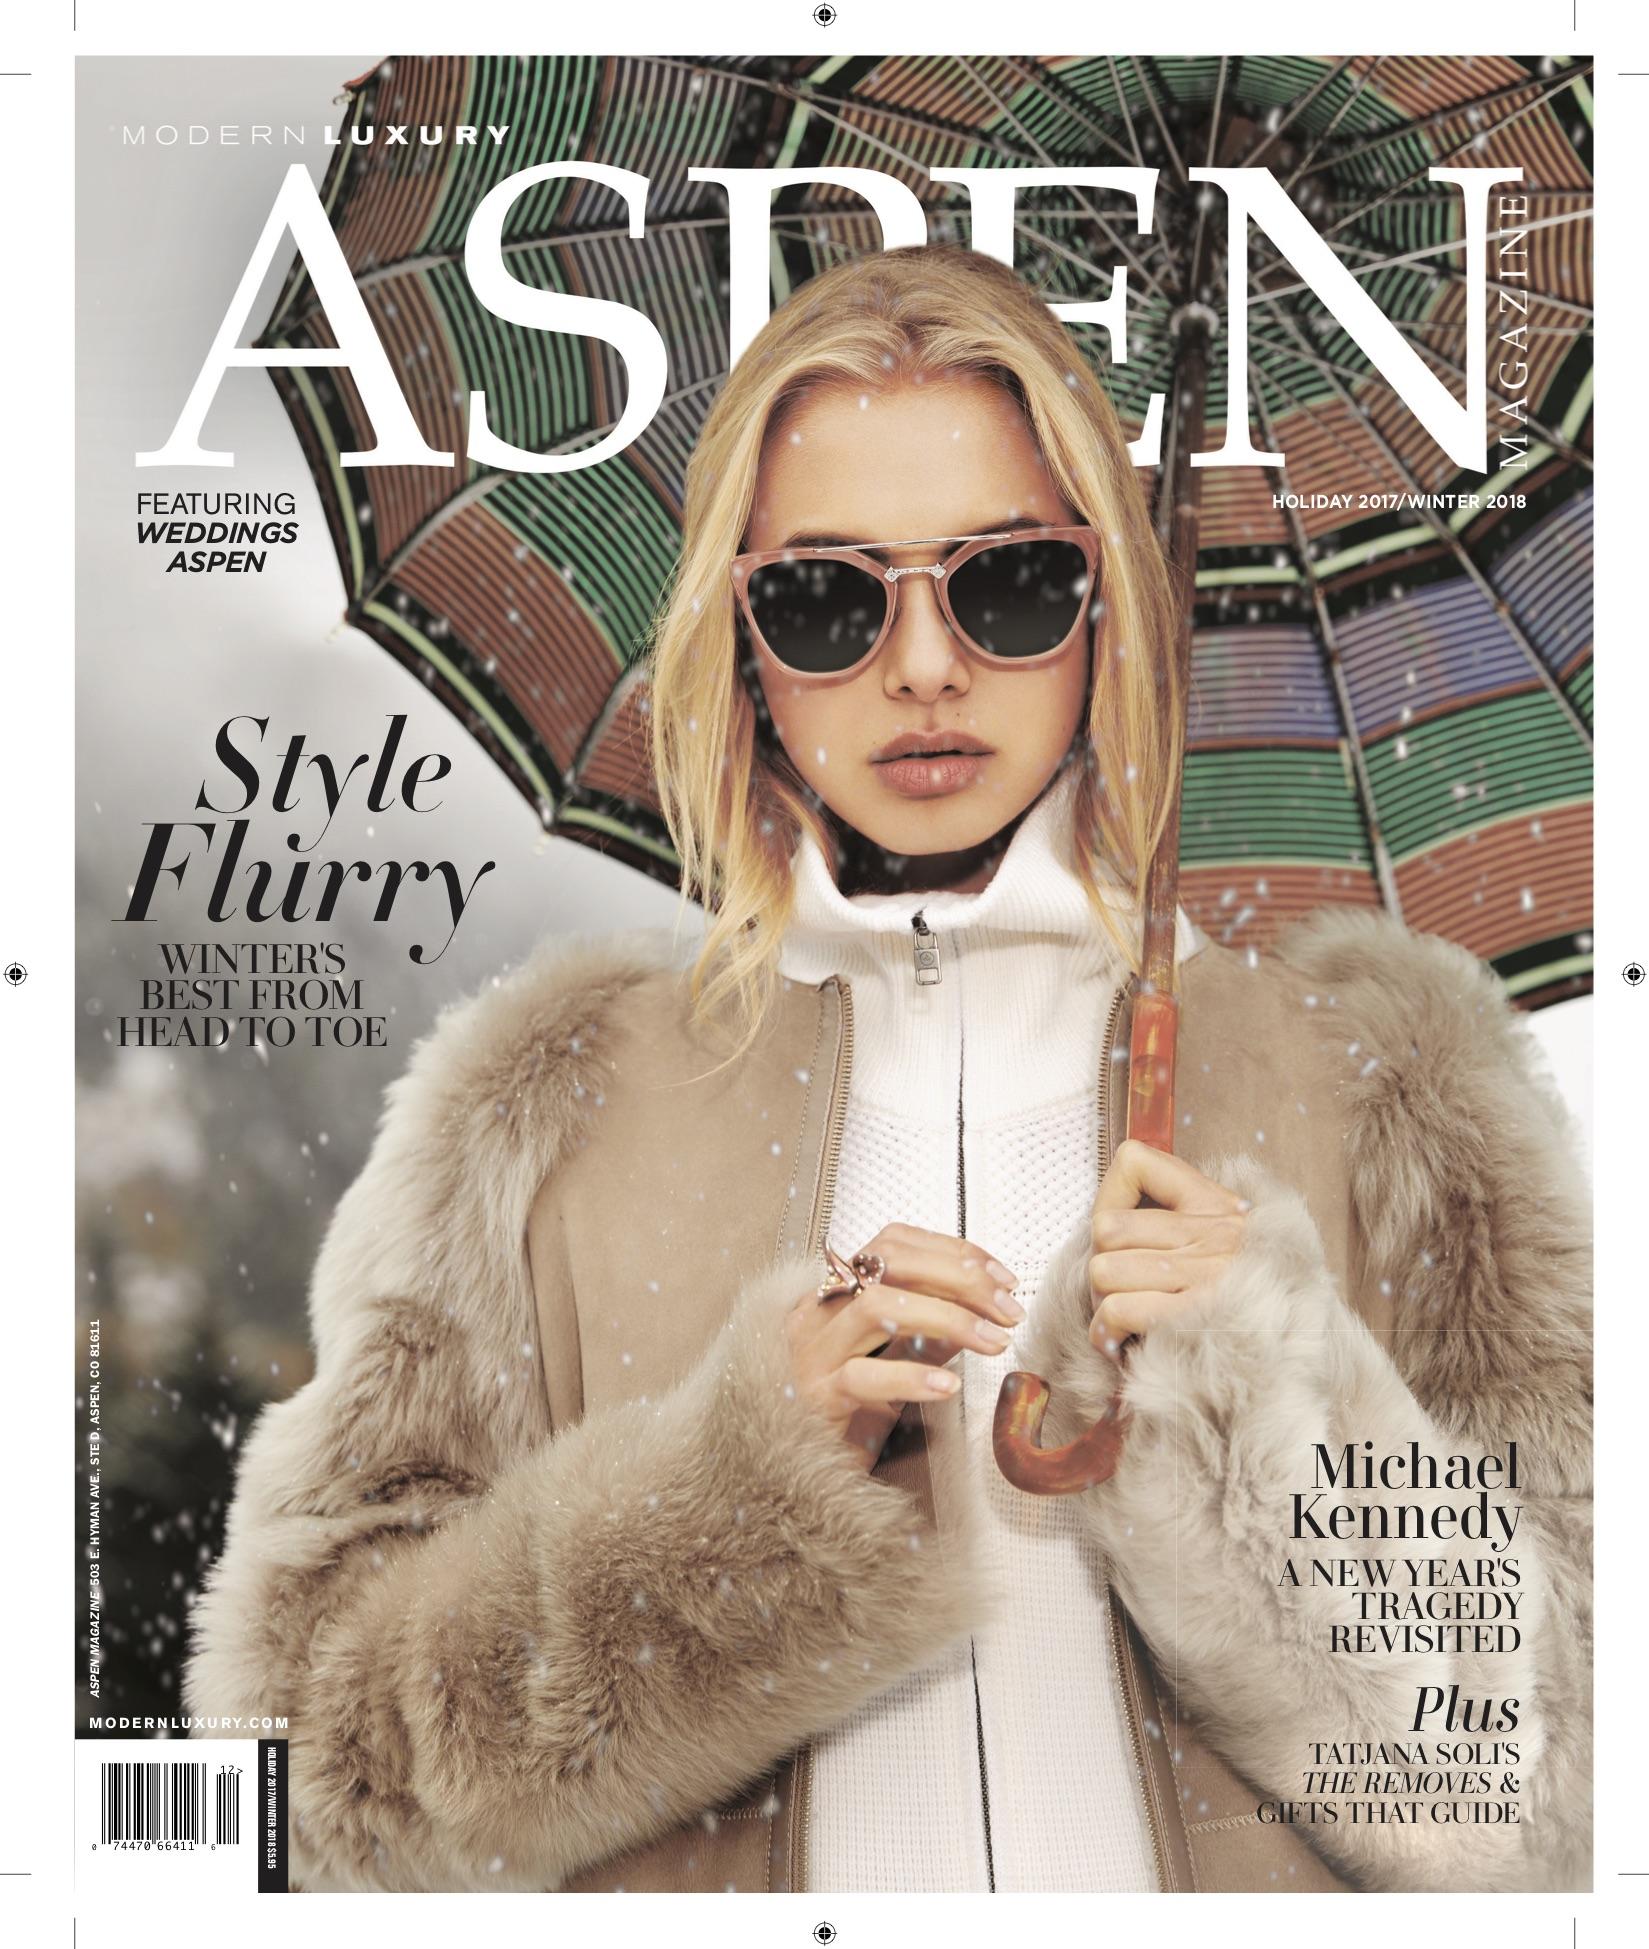 aspen-magazinev2.jpg